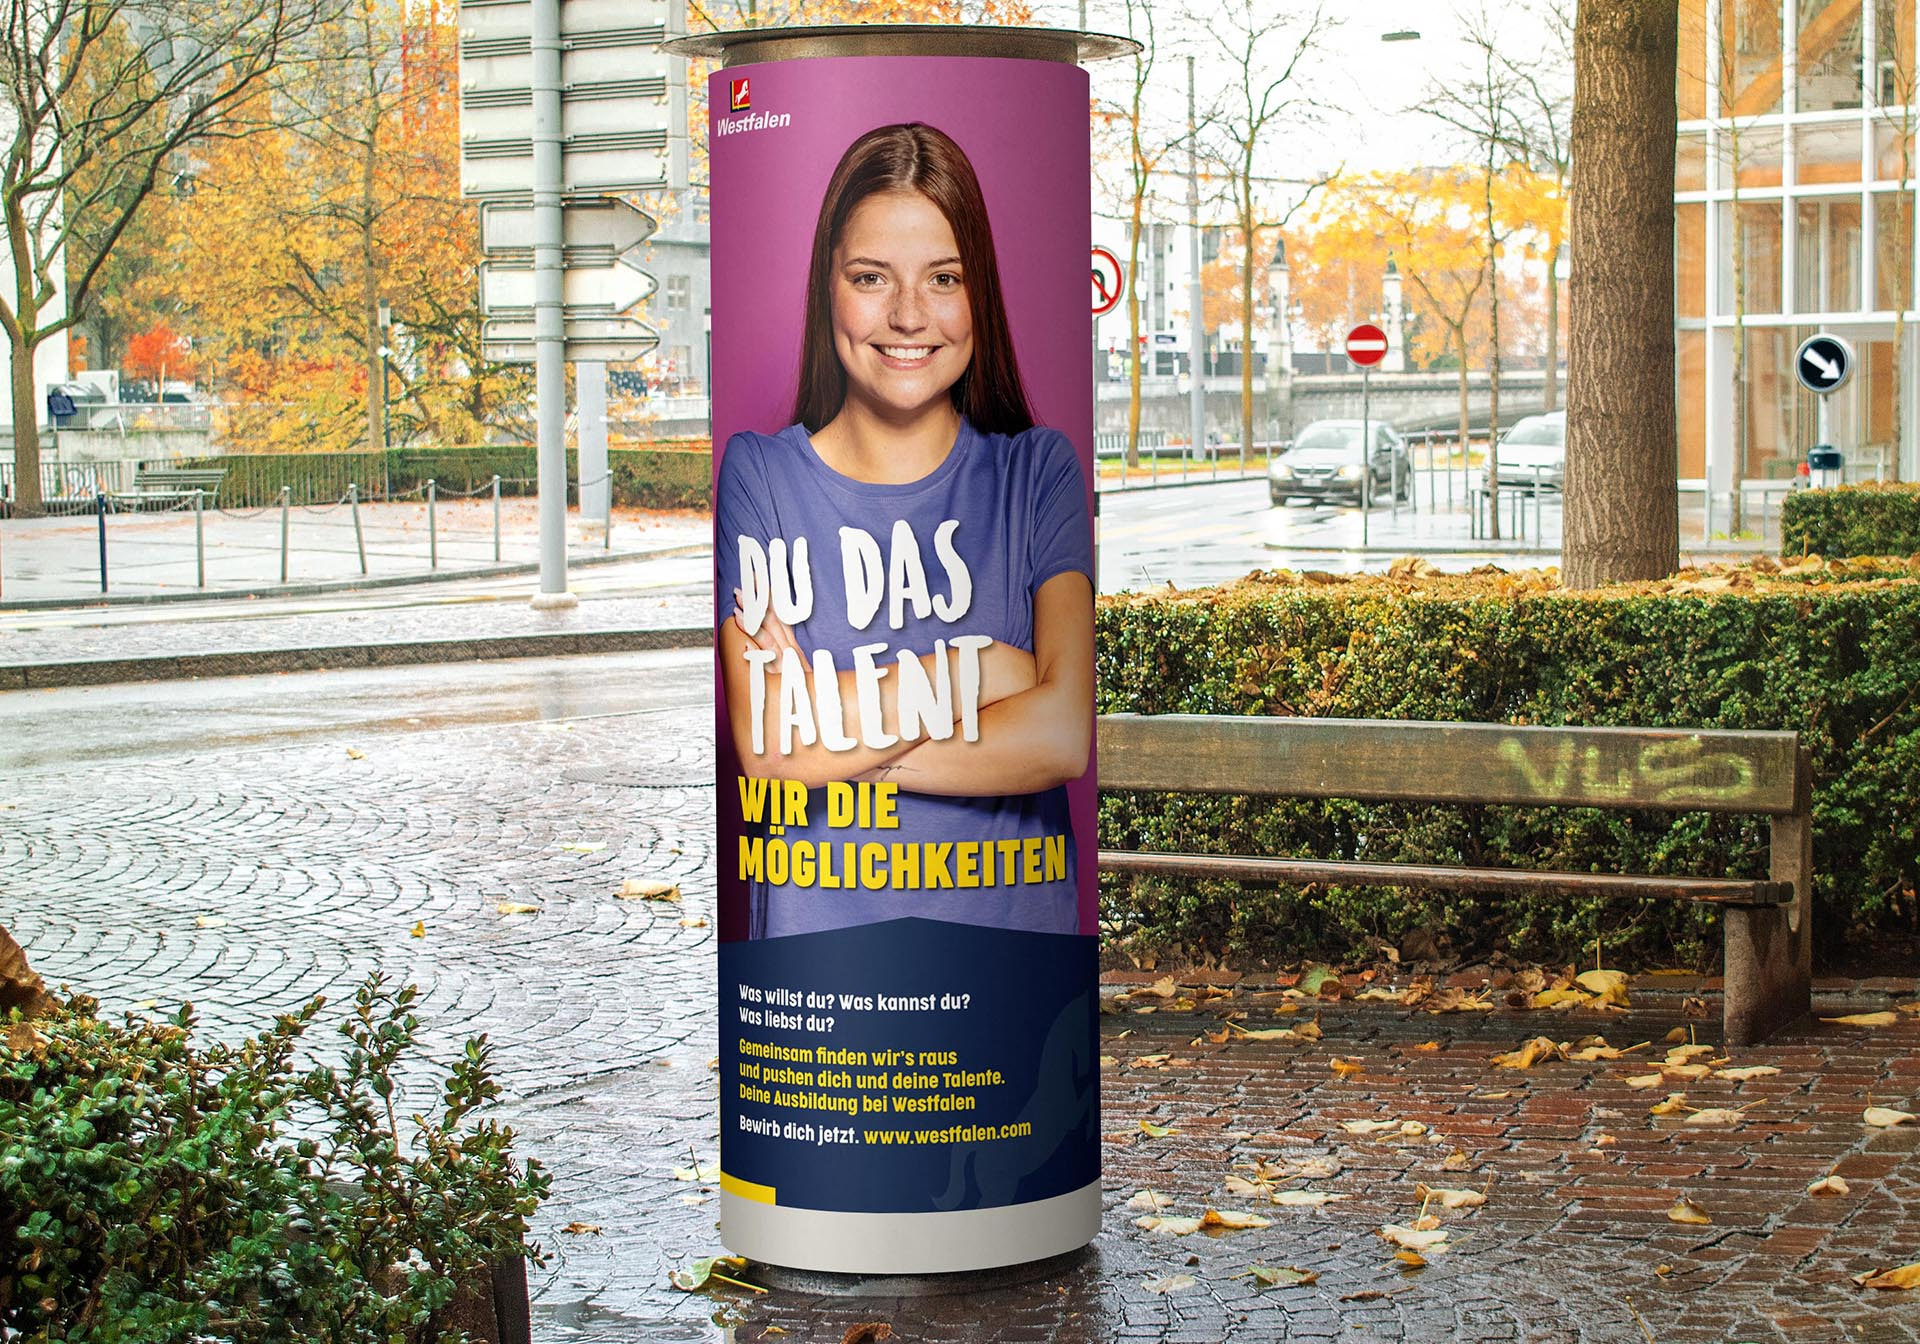 Plakat Litfaßsäule Entwicklung Azubi-Kampagne für Westfalen Group, Videoclips, Social-Media, Werbung